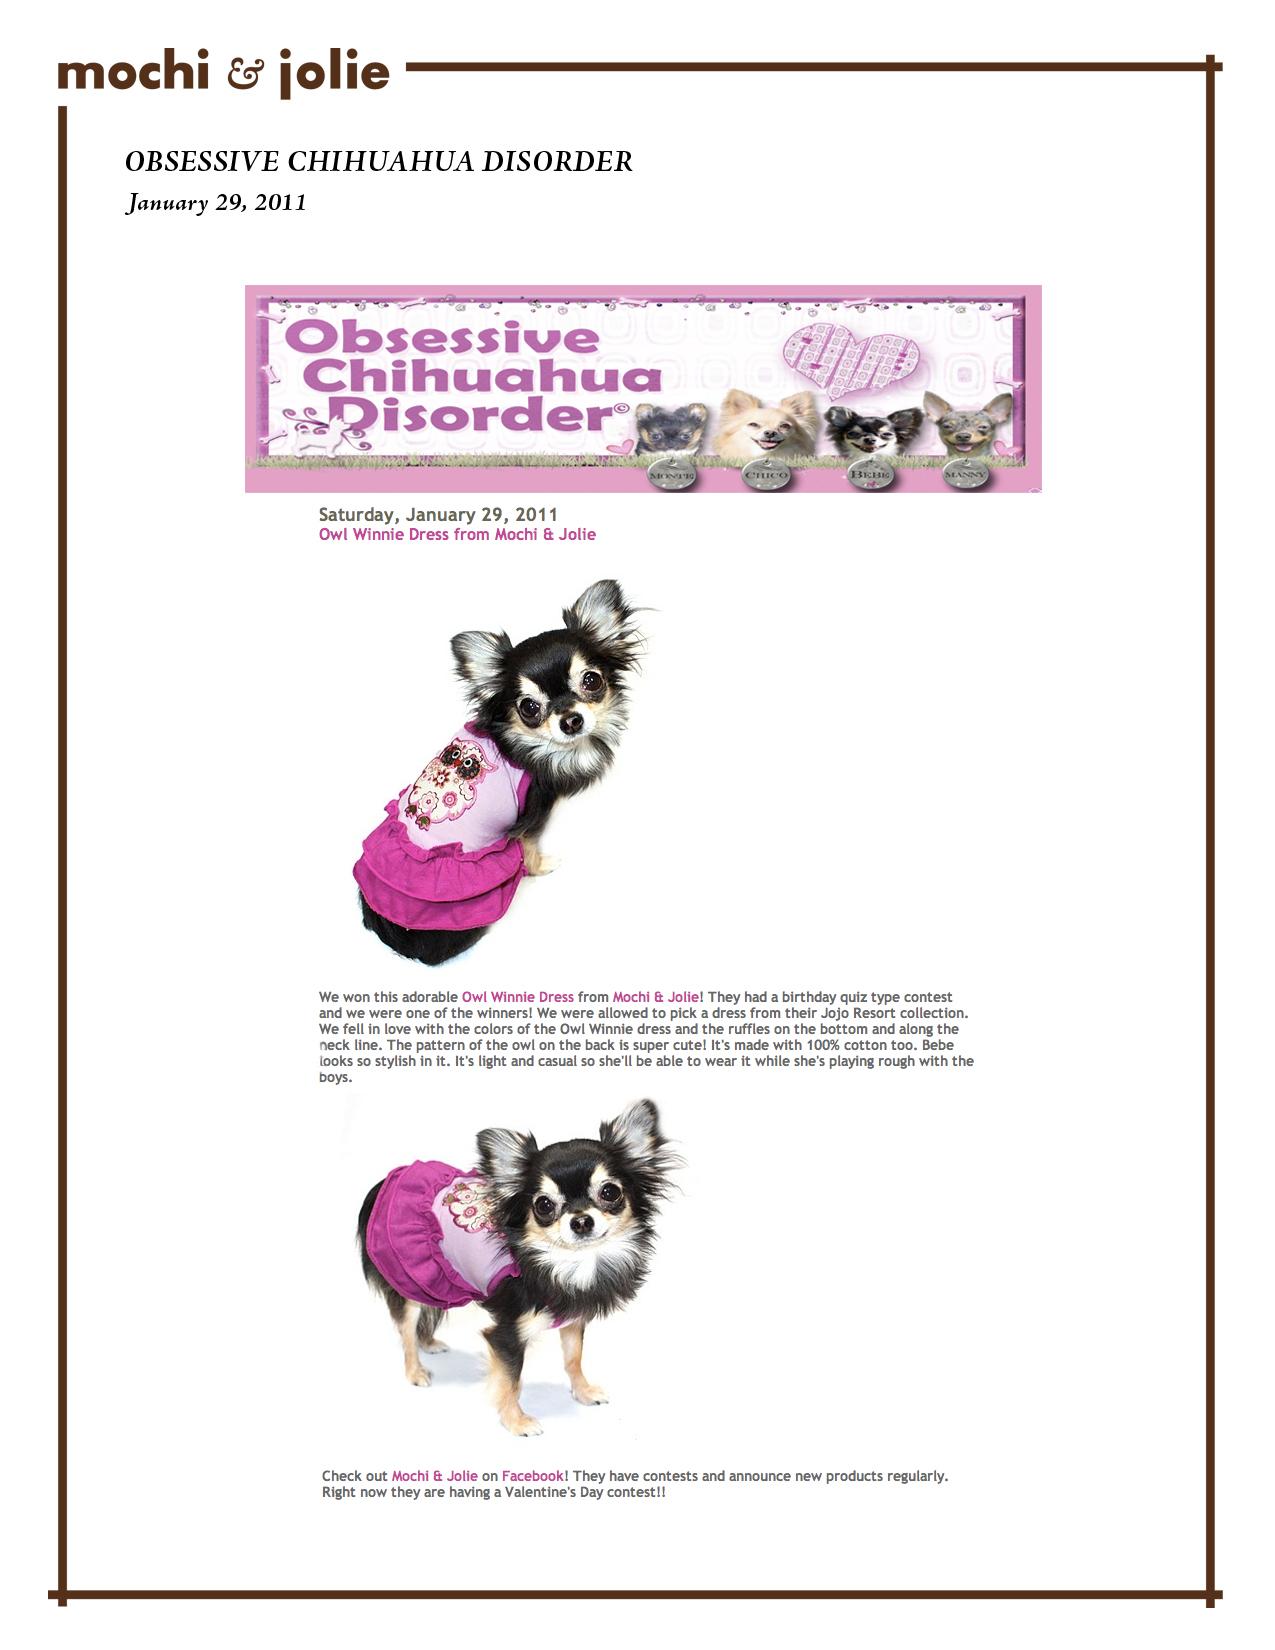 Obsessive Chihuahua Disorder (January 29, 2011)